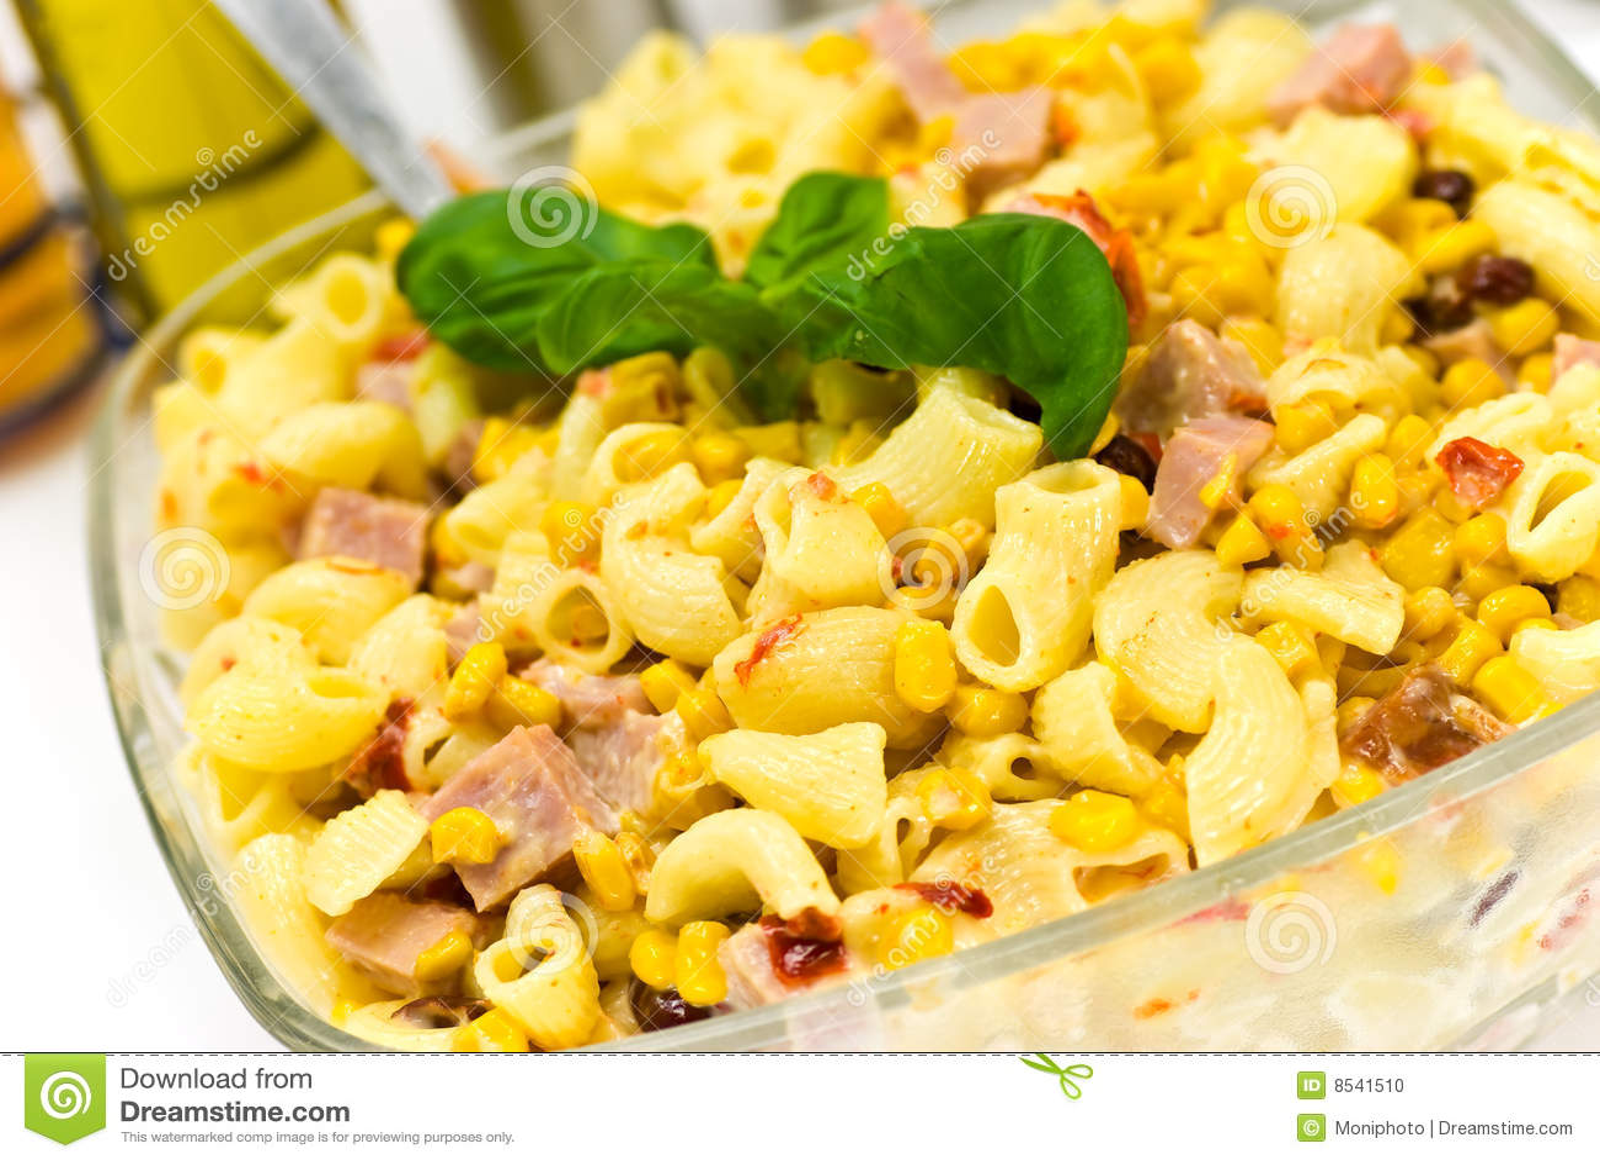 A pasta salad with ham